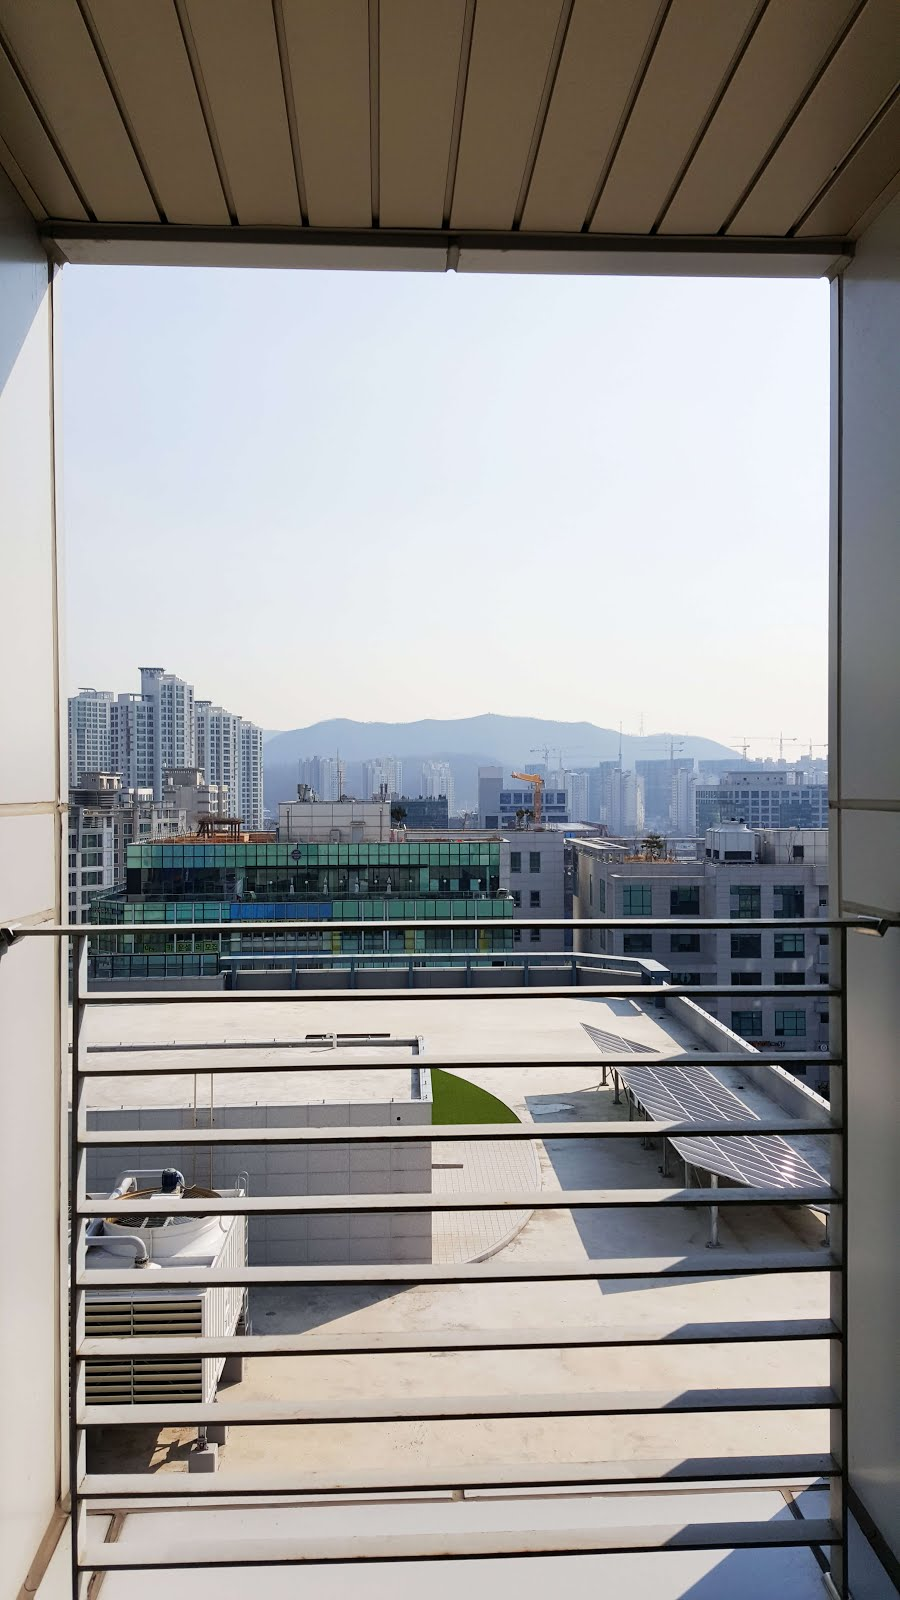 moving to south korea e2 visa teaching